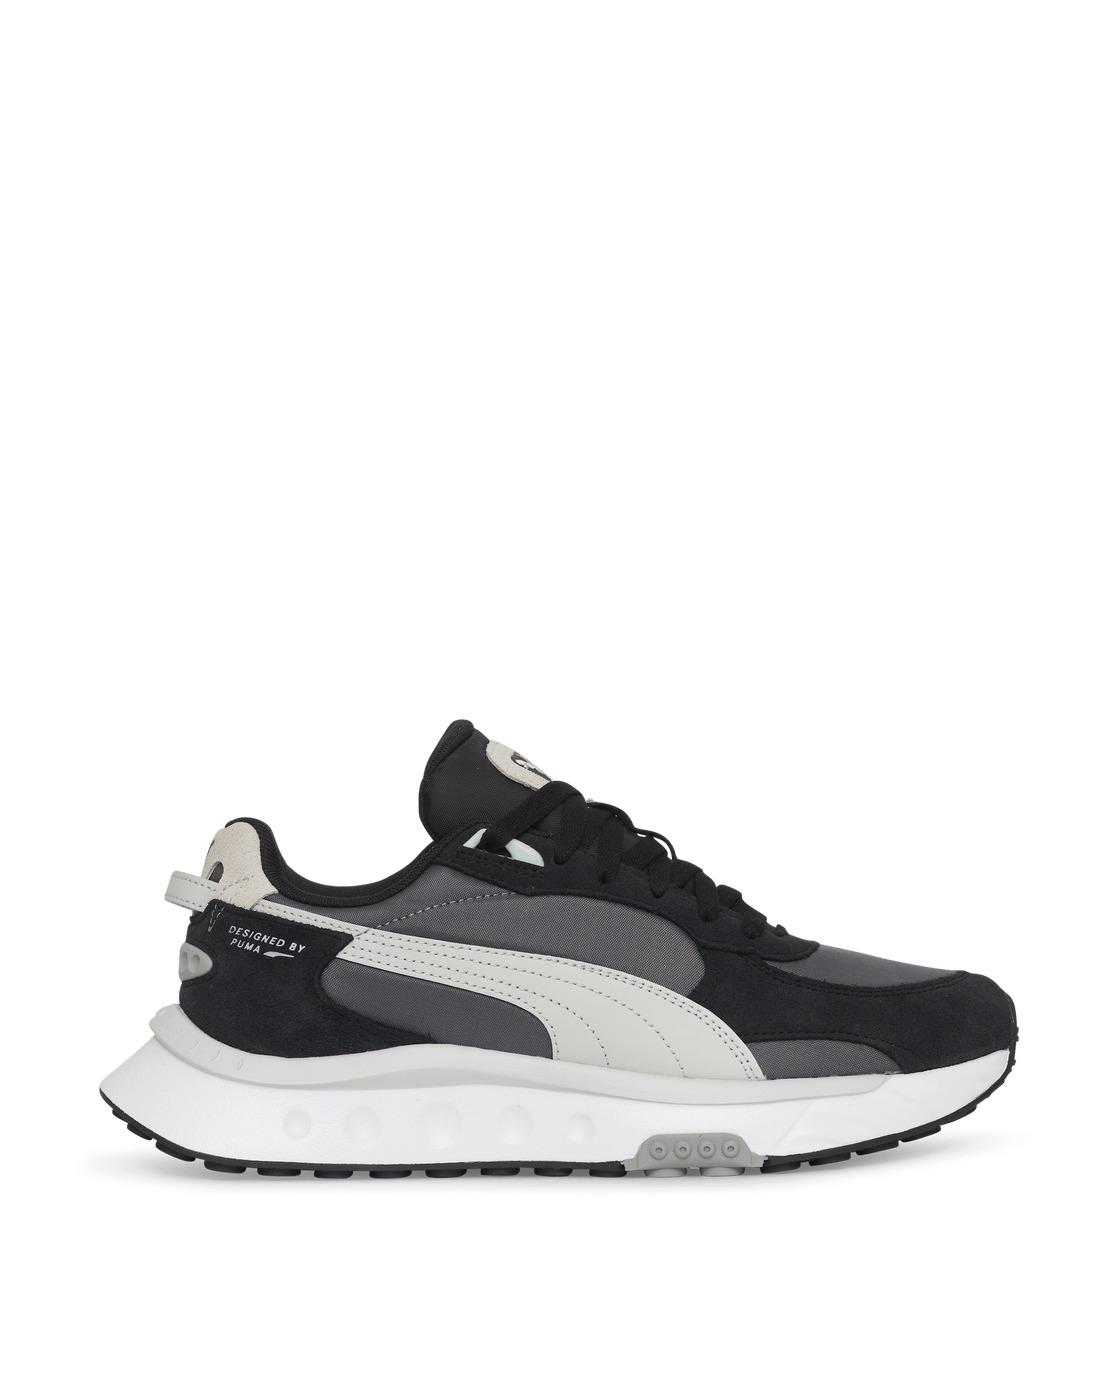 Puma Wild Rider Rollin' Sneakers Puma Black/Castlerock Puma